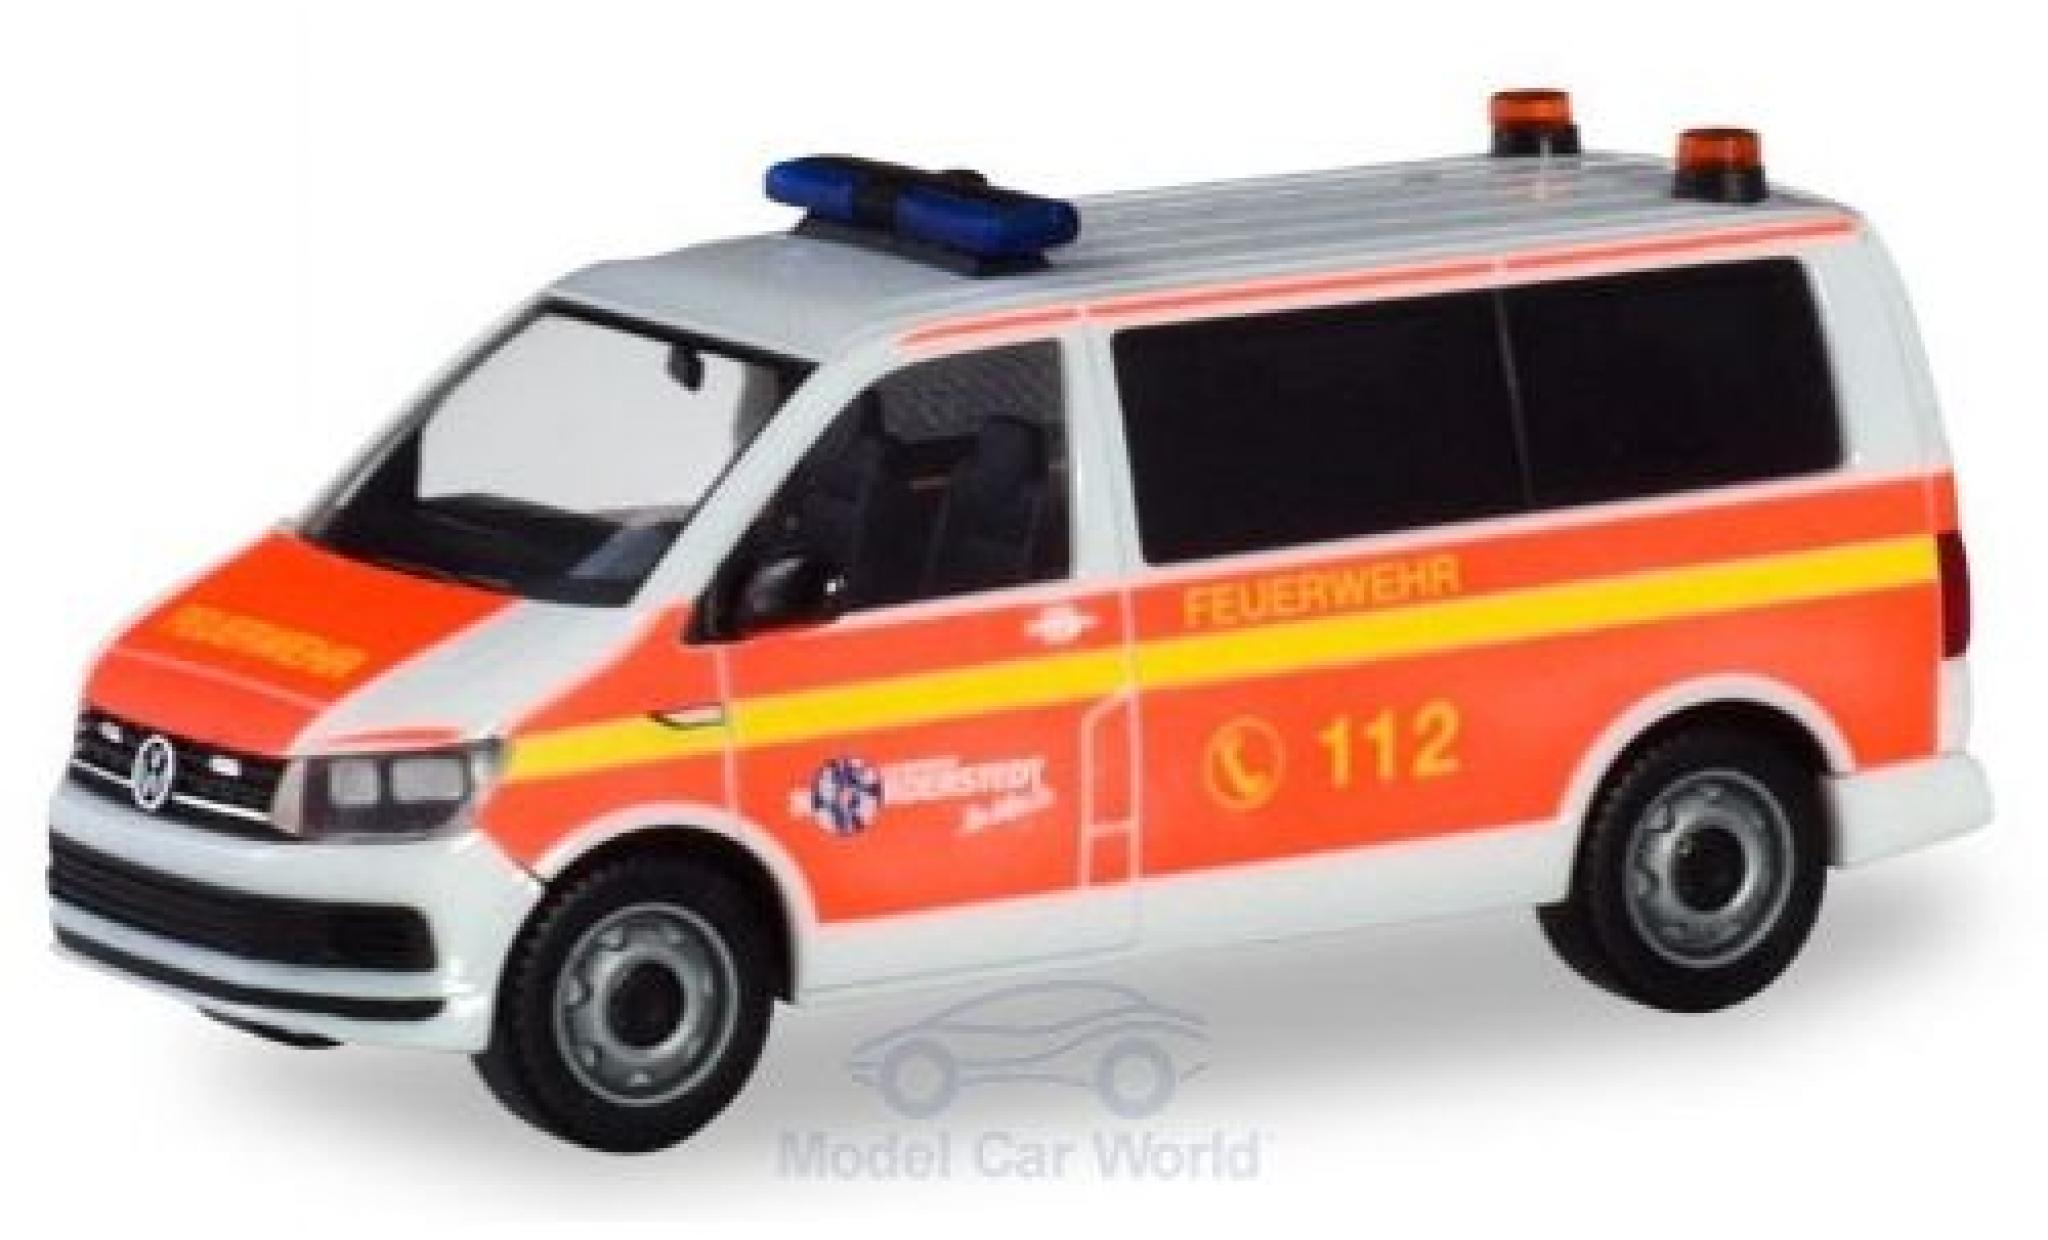 Volkswagen T6 1/87 Herpa Bus Freiwillige Feuerwehr Norderstedt Mannschaftstransportwagen